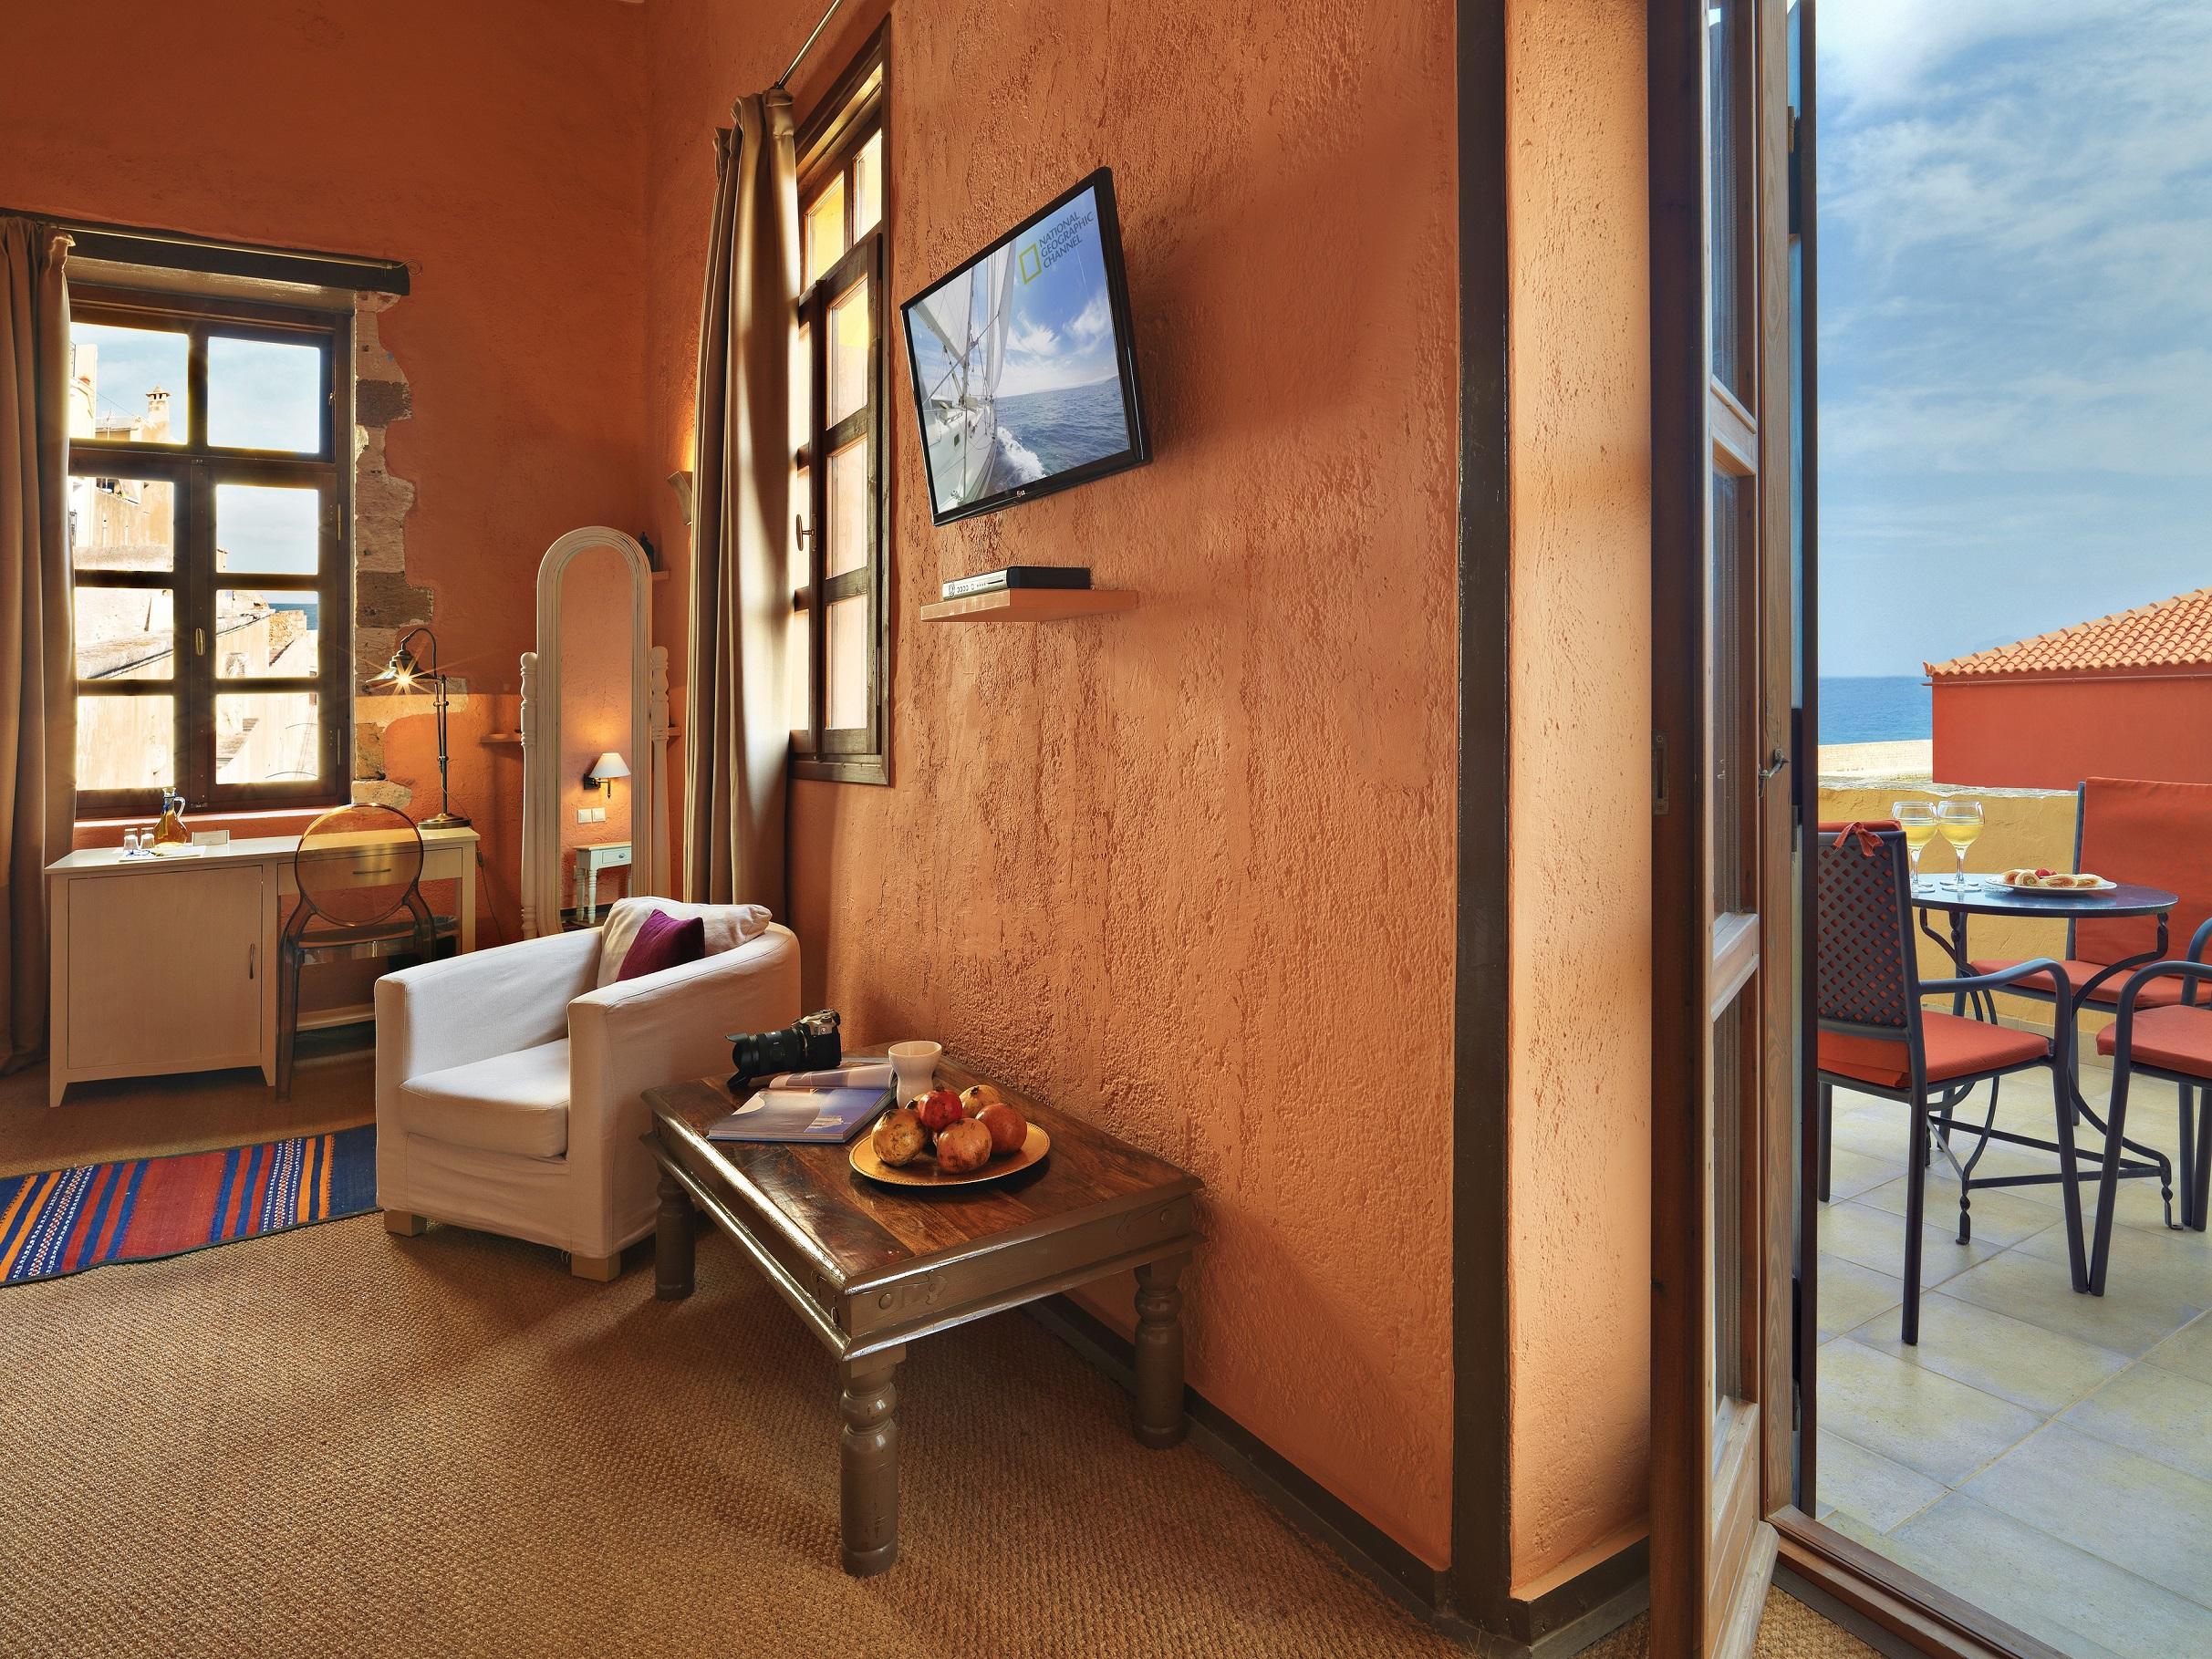 Alcanea boutique hotel terrabook for Hip hotels book